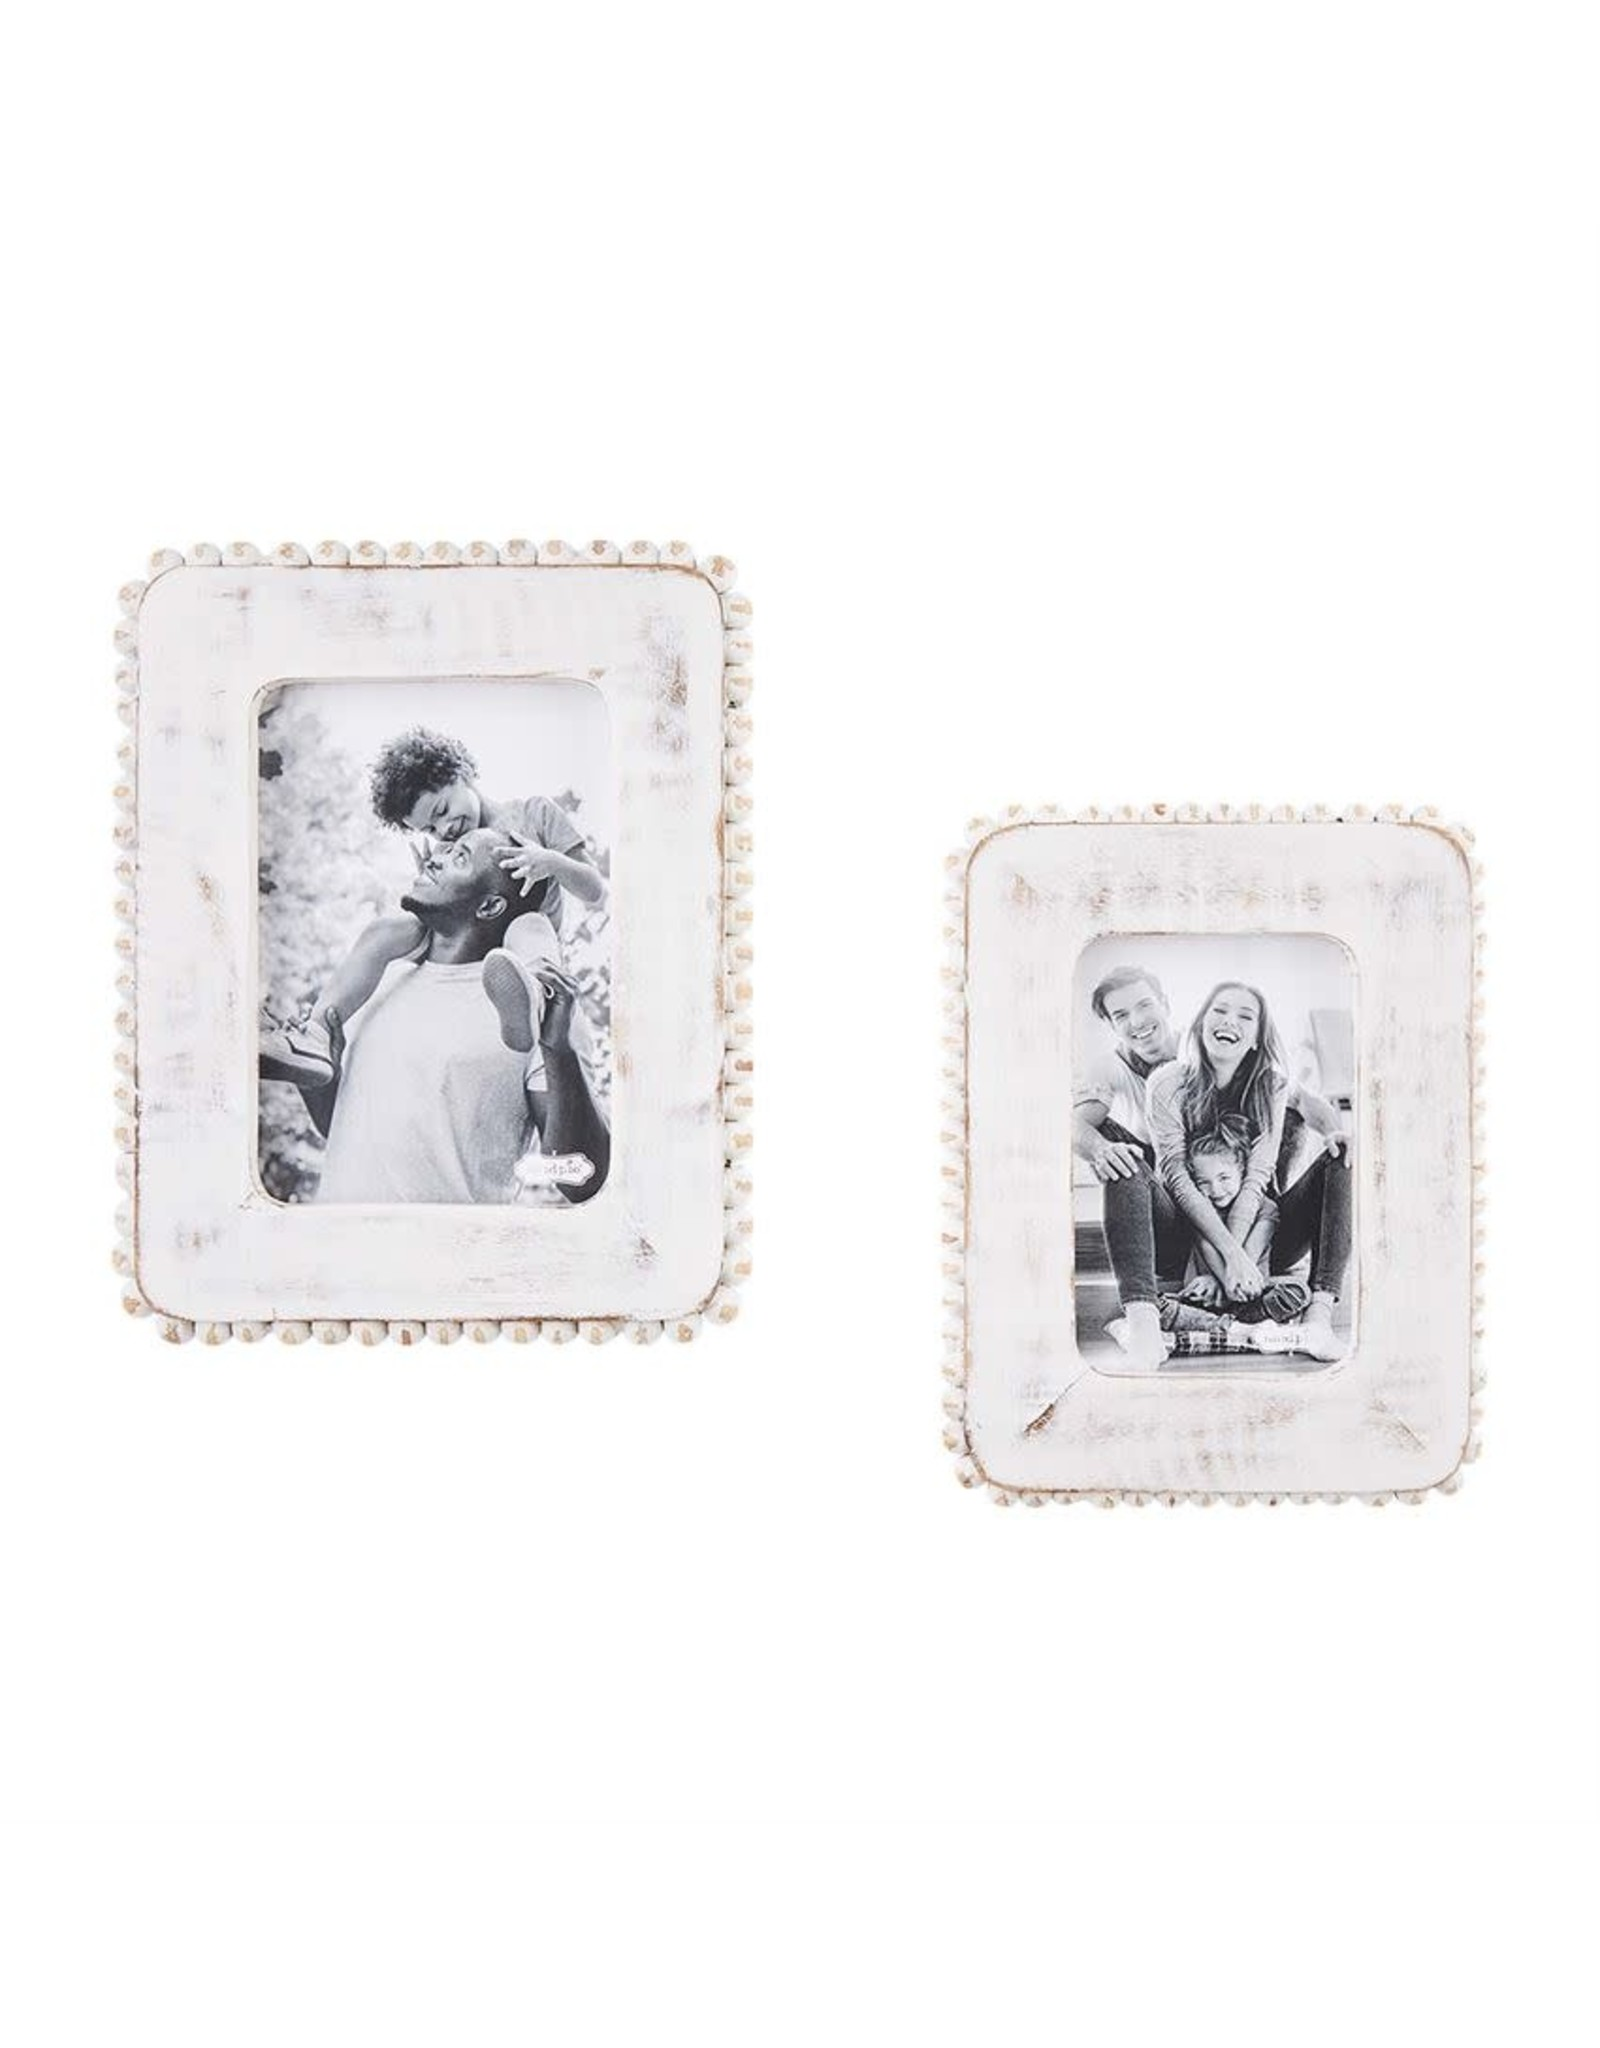 Mudpie White Beaded Wood Frame 4x6